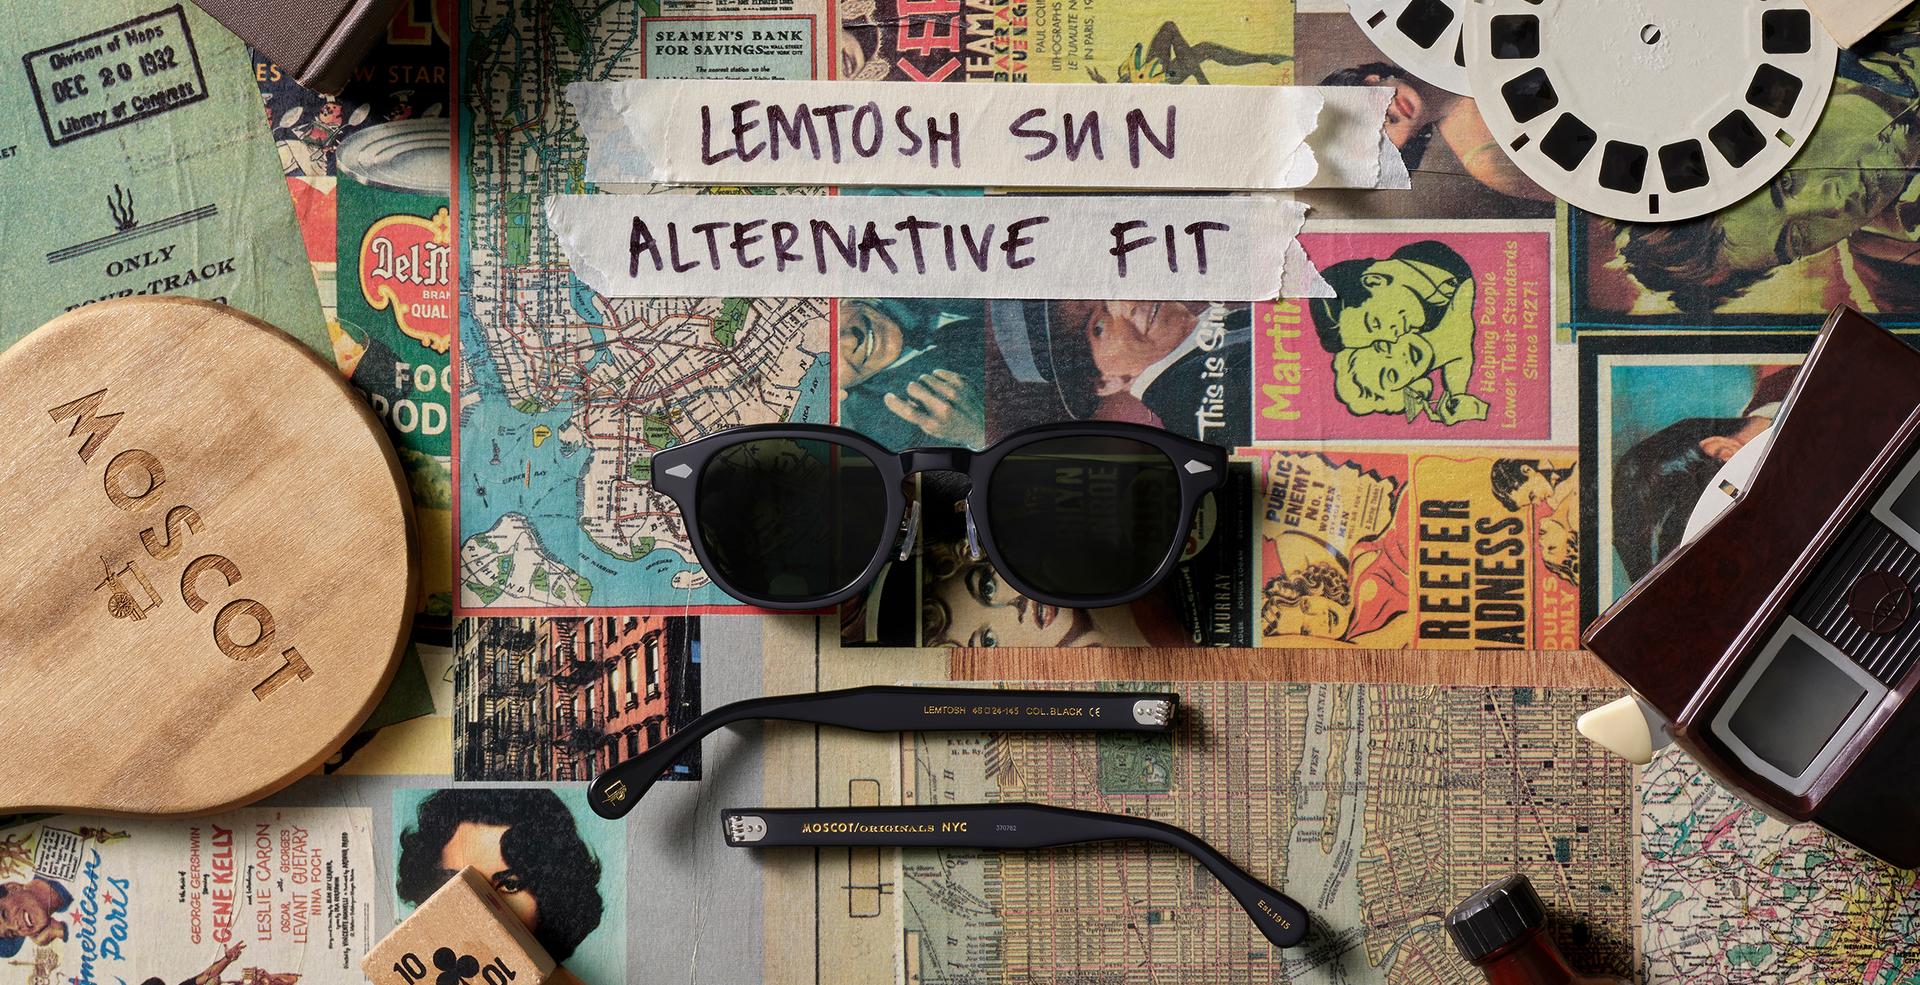 LEMTOSH SUN Alternative Fit